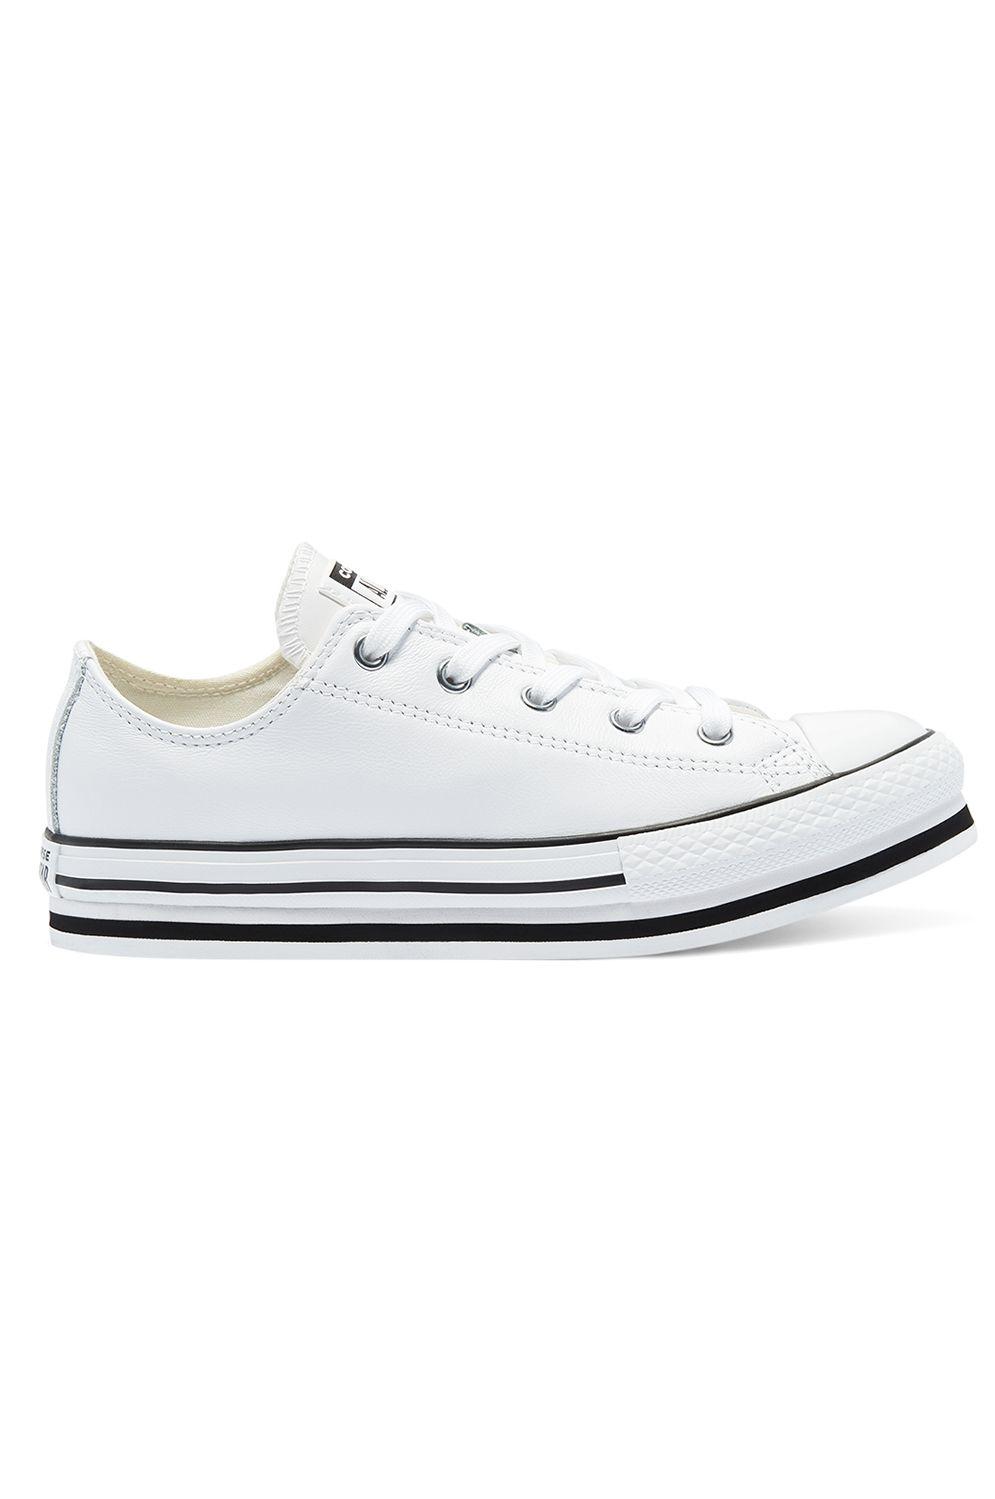 Converse Shoes CHUCK TAYLOR ALL STAR PLATFORM EVA OX White/Black/Egret